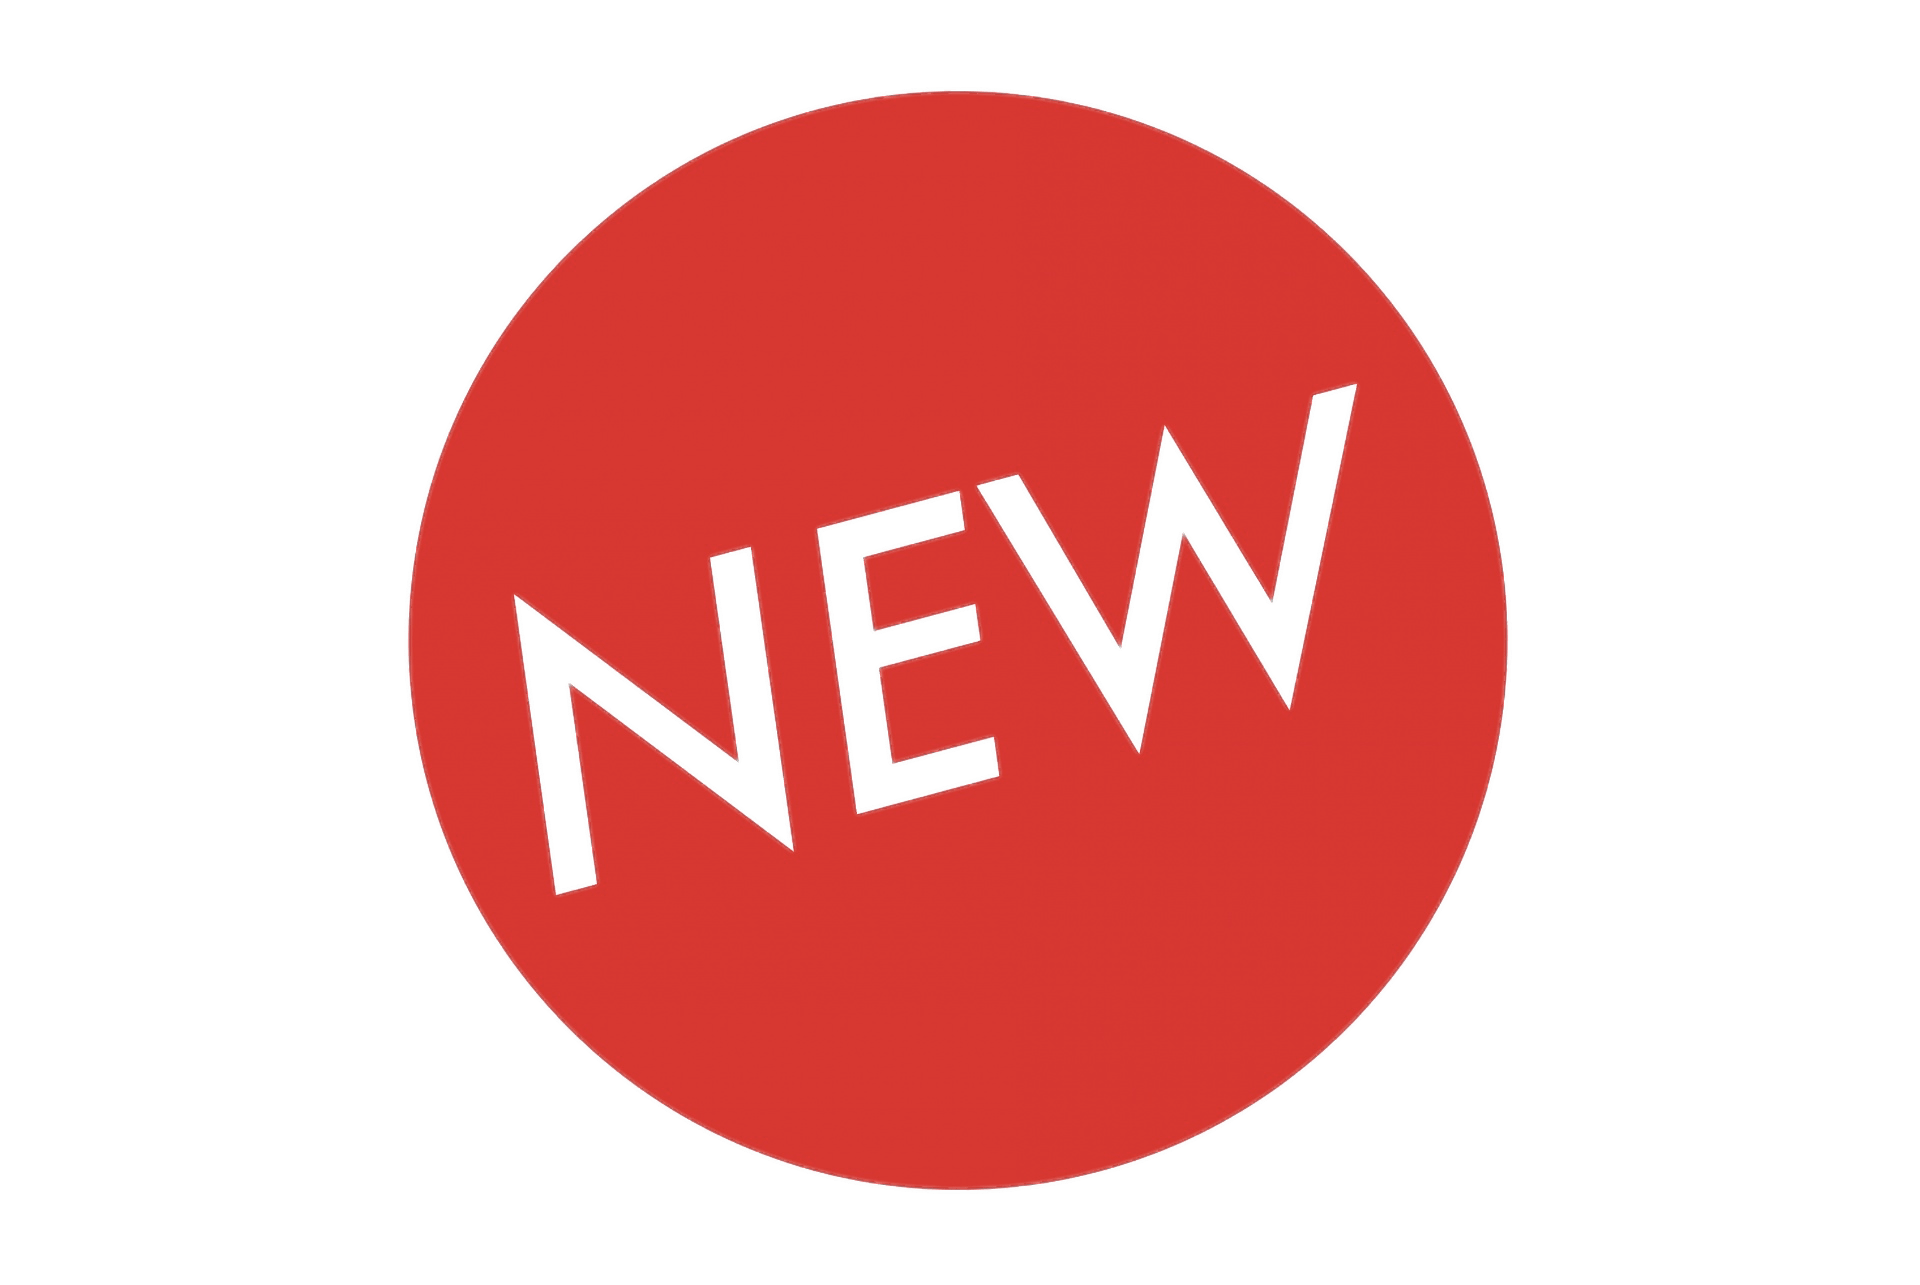 Large New Circle Label transparent PNG.